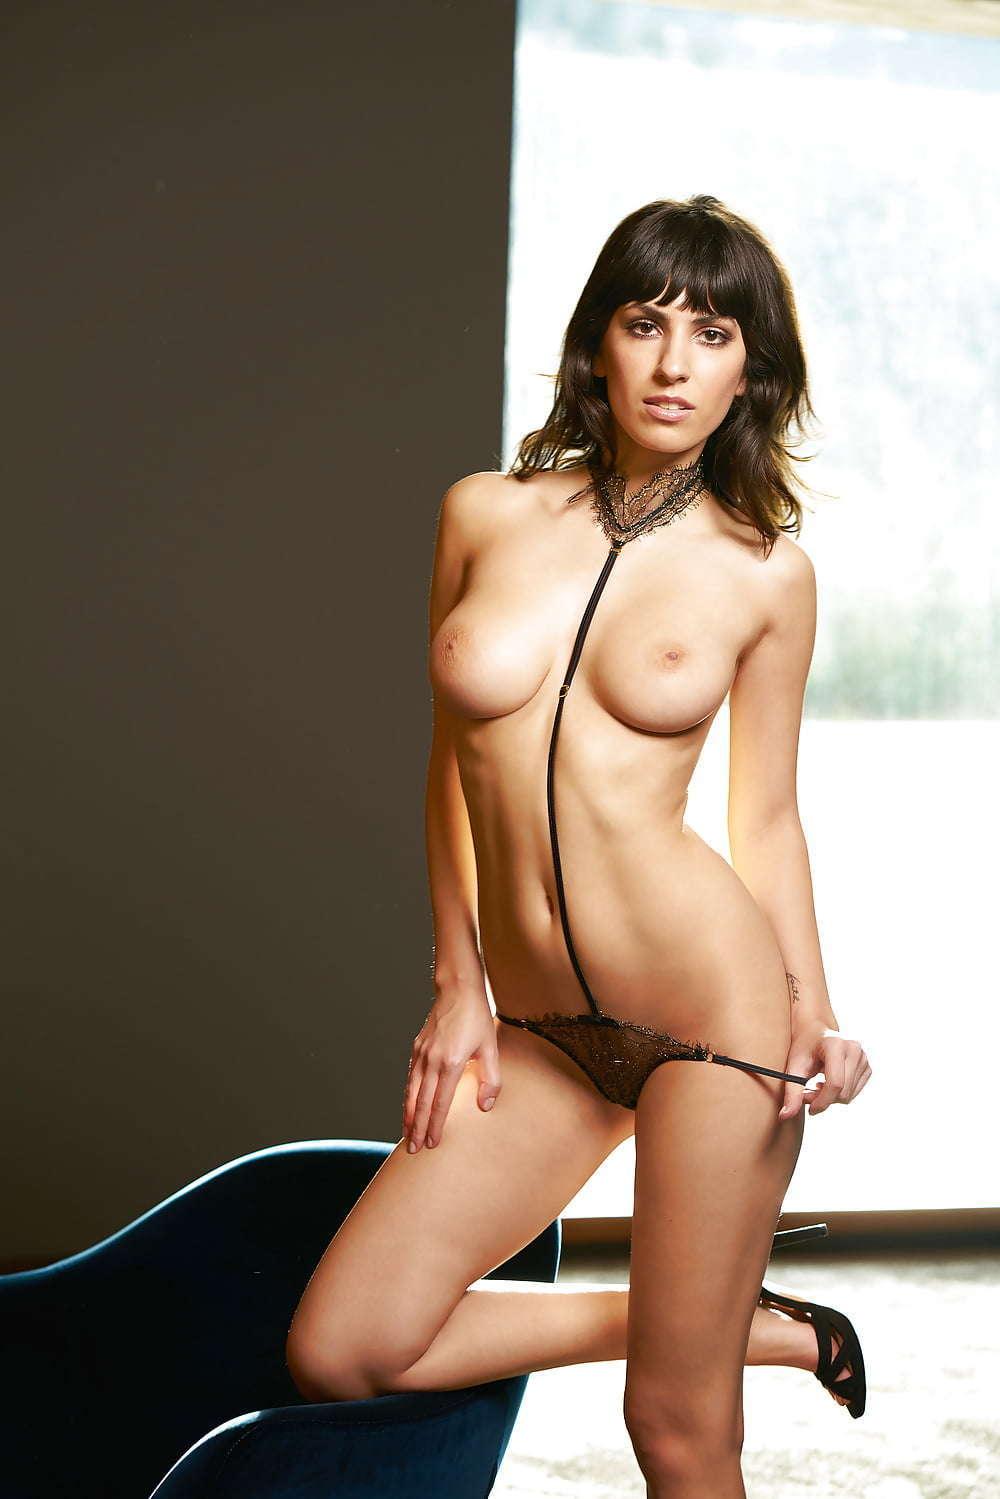 Jacqueline scherer nude